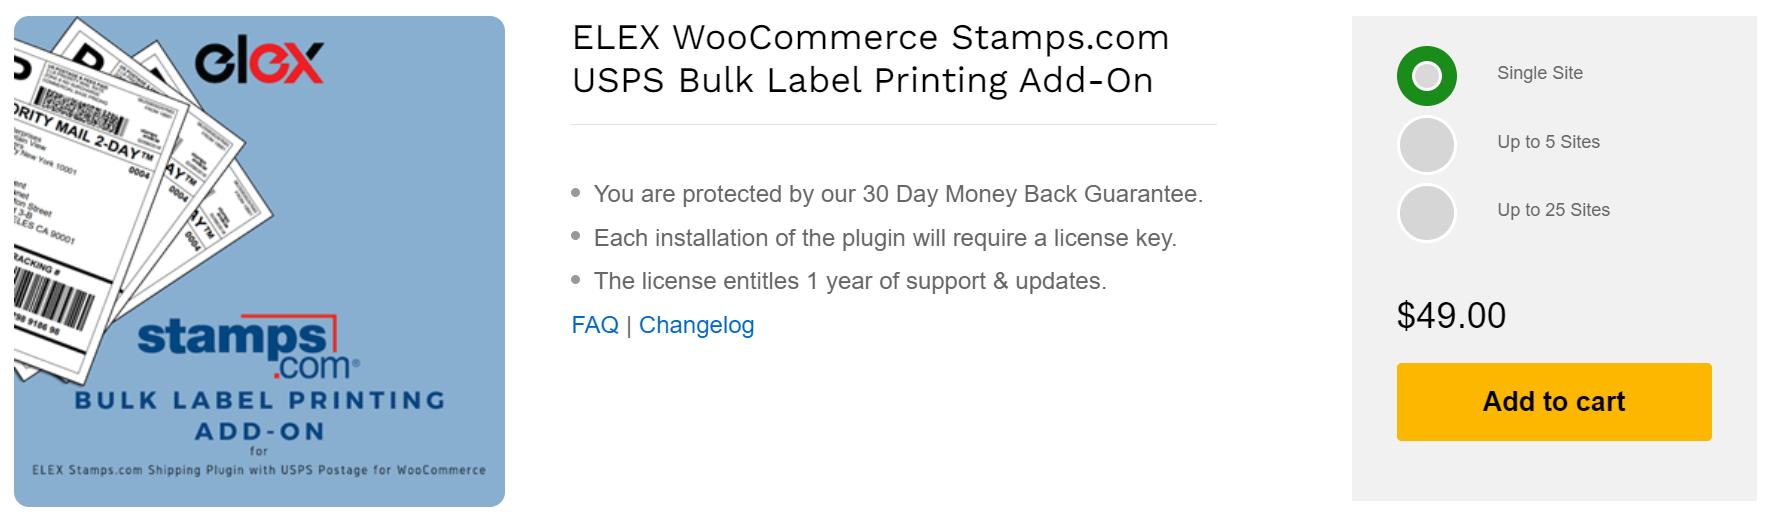 ELEX WooCommerce Stamps.com USPS Bulk Label Printing Add-On